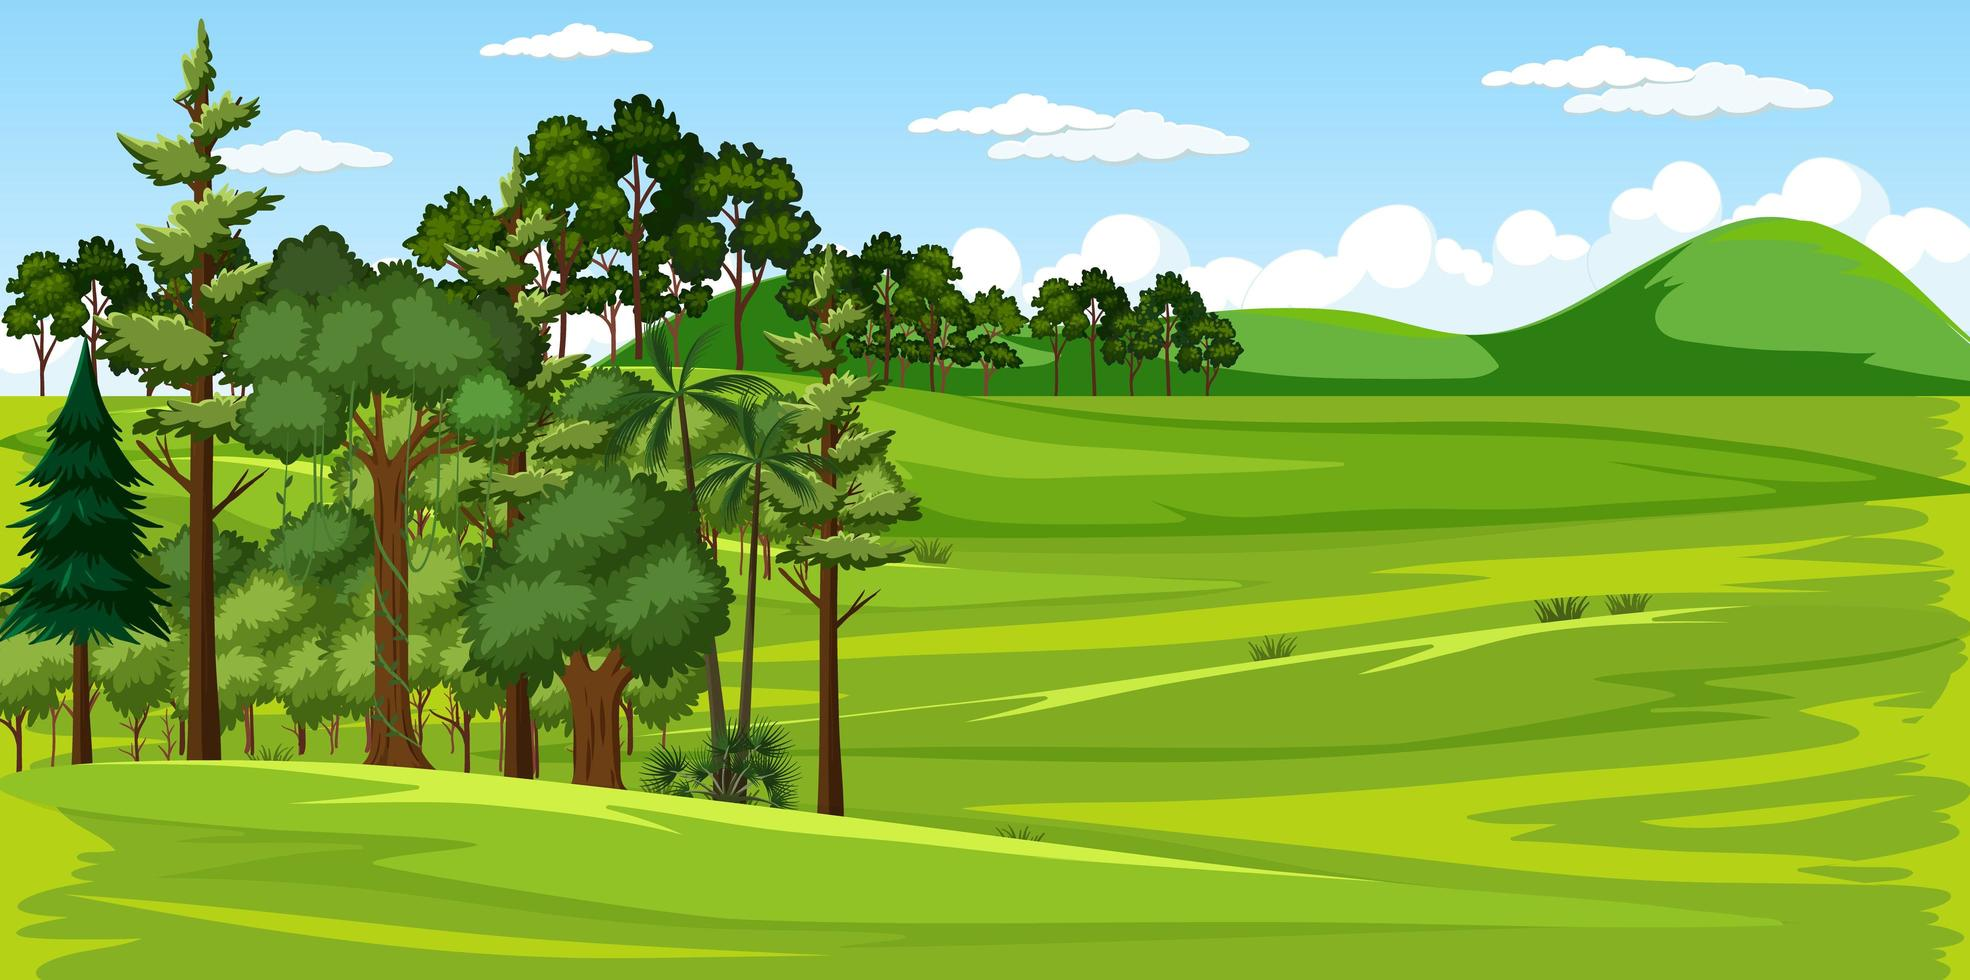 Blank Green Meadow Nature Landscape Scene Download Free Vectors Clipart Graphics Vector Art